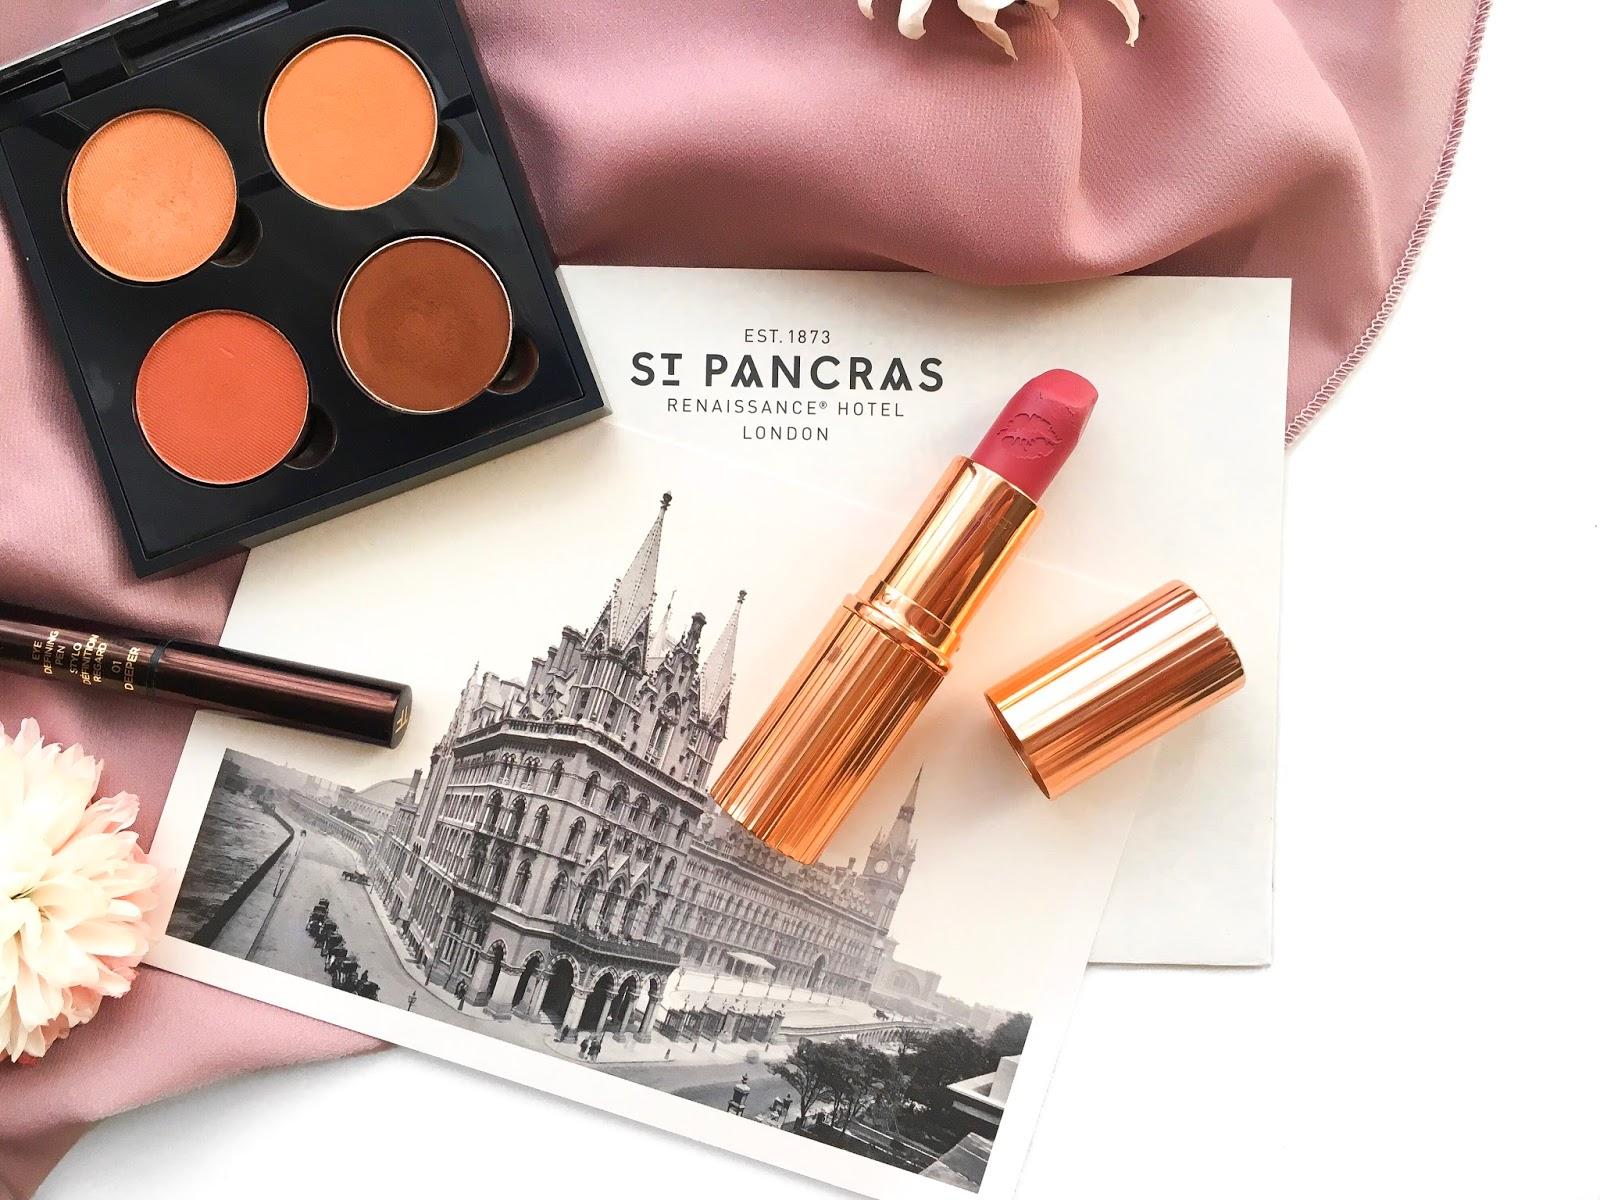 secret salma, charlotte tilbury hot lips secret salma, st pancras, st pancras renaissance hotel, abh quad